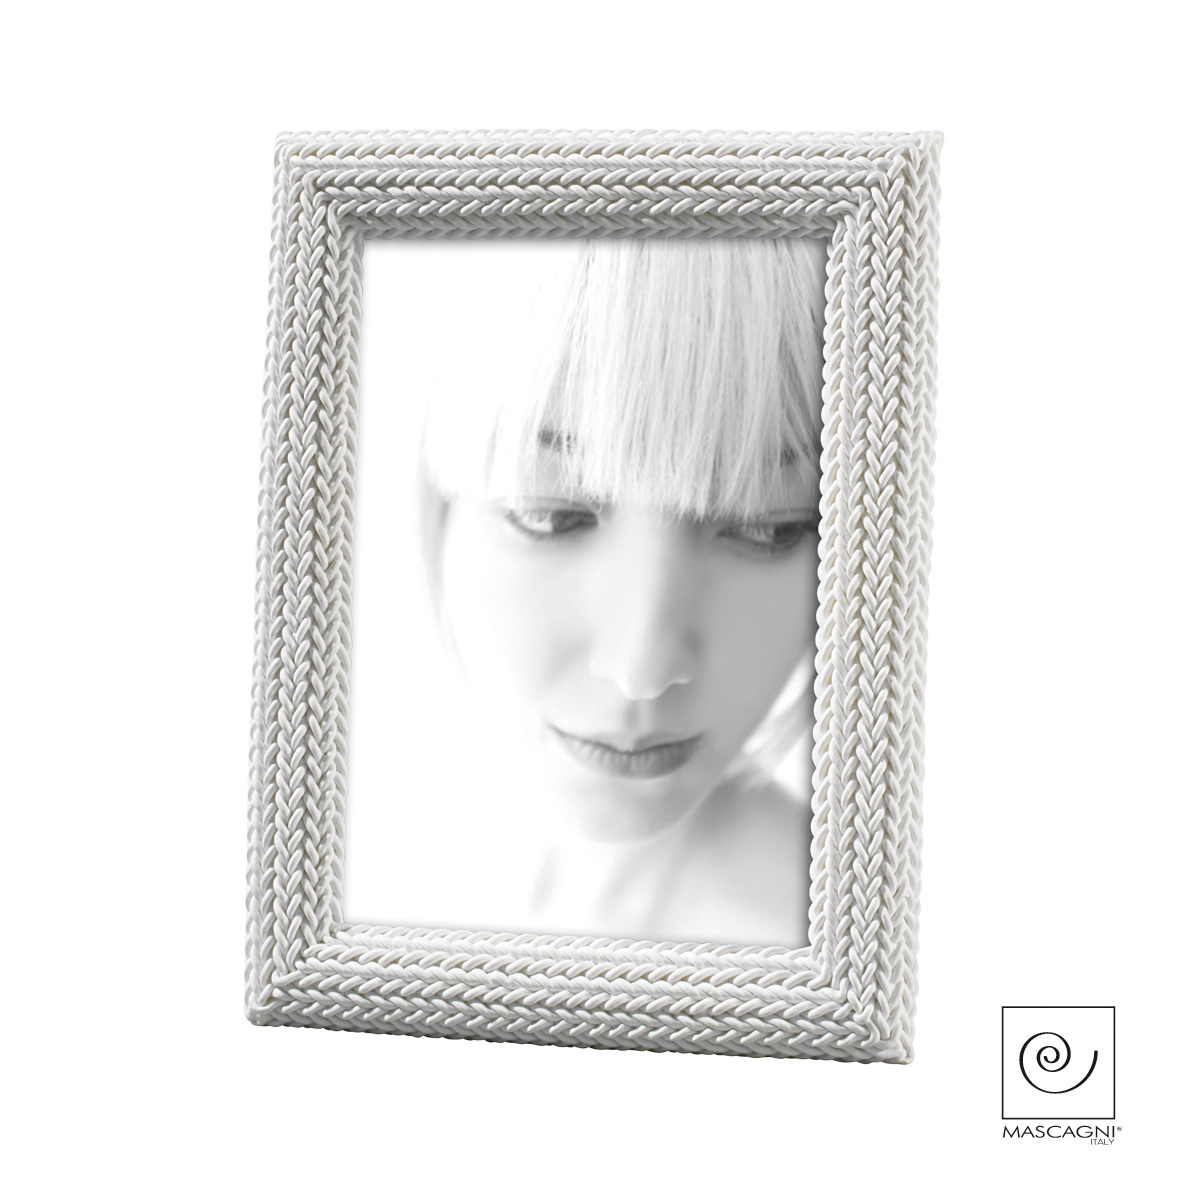 Art Mascagni A110 PHOTO FRAME 13X18 - COL.DOVE GRAY